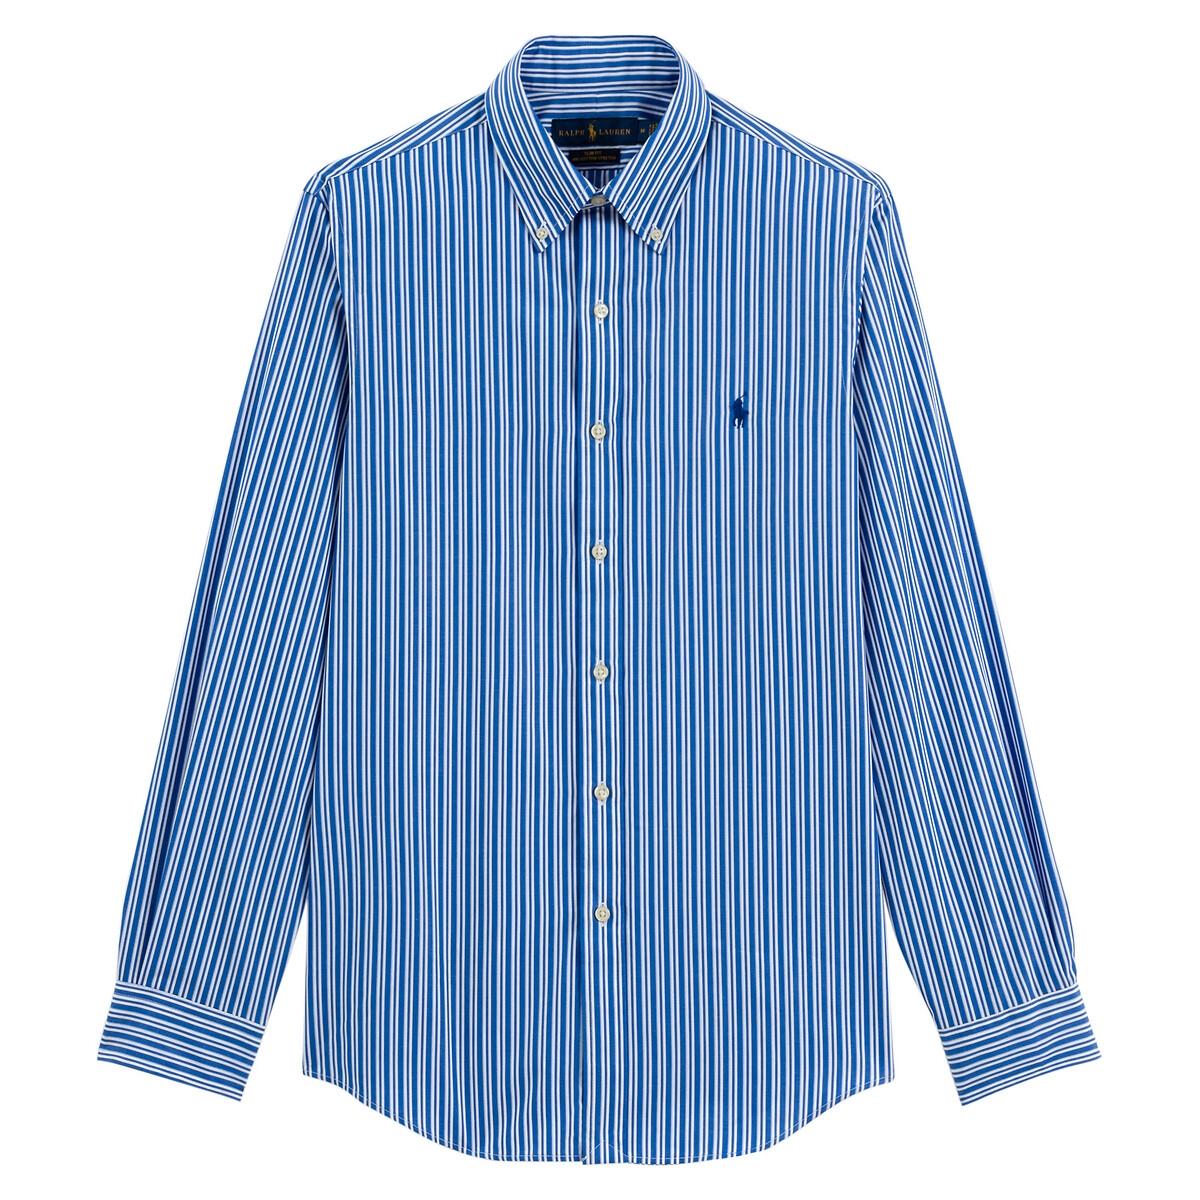 Рубашка La Redoute Слим из поплина стретч в полоску S синий рубашка la redoute джинсовая узкая jjesheridan s синий